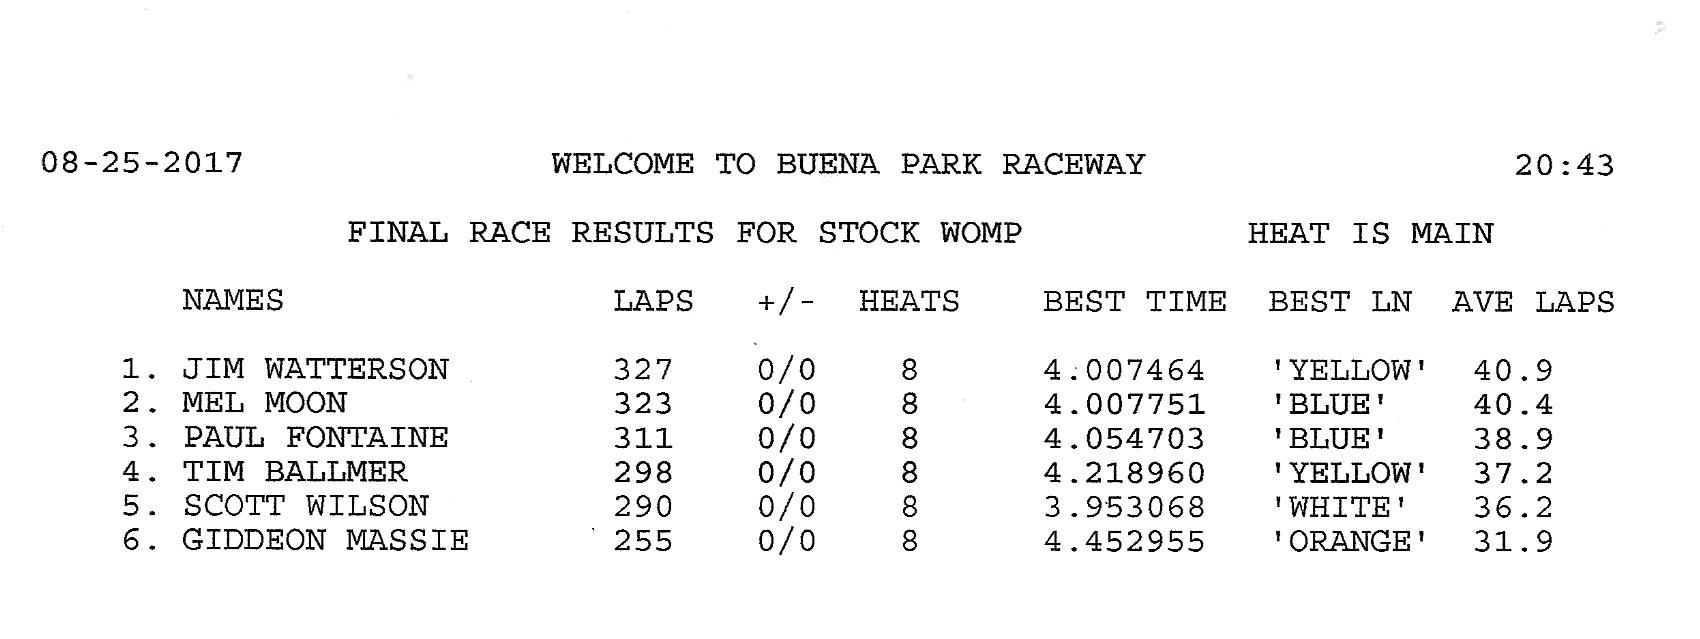 82517 womp results.jpeg